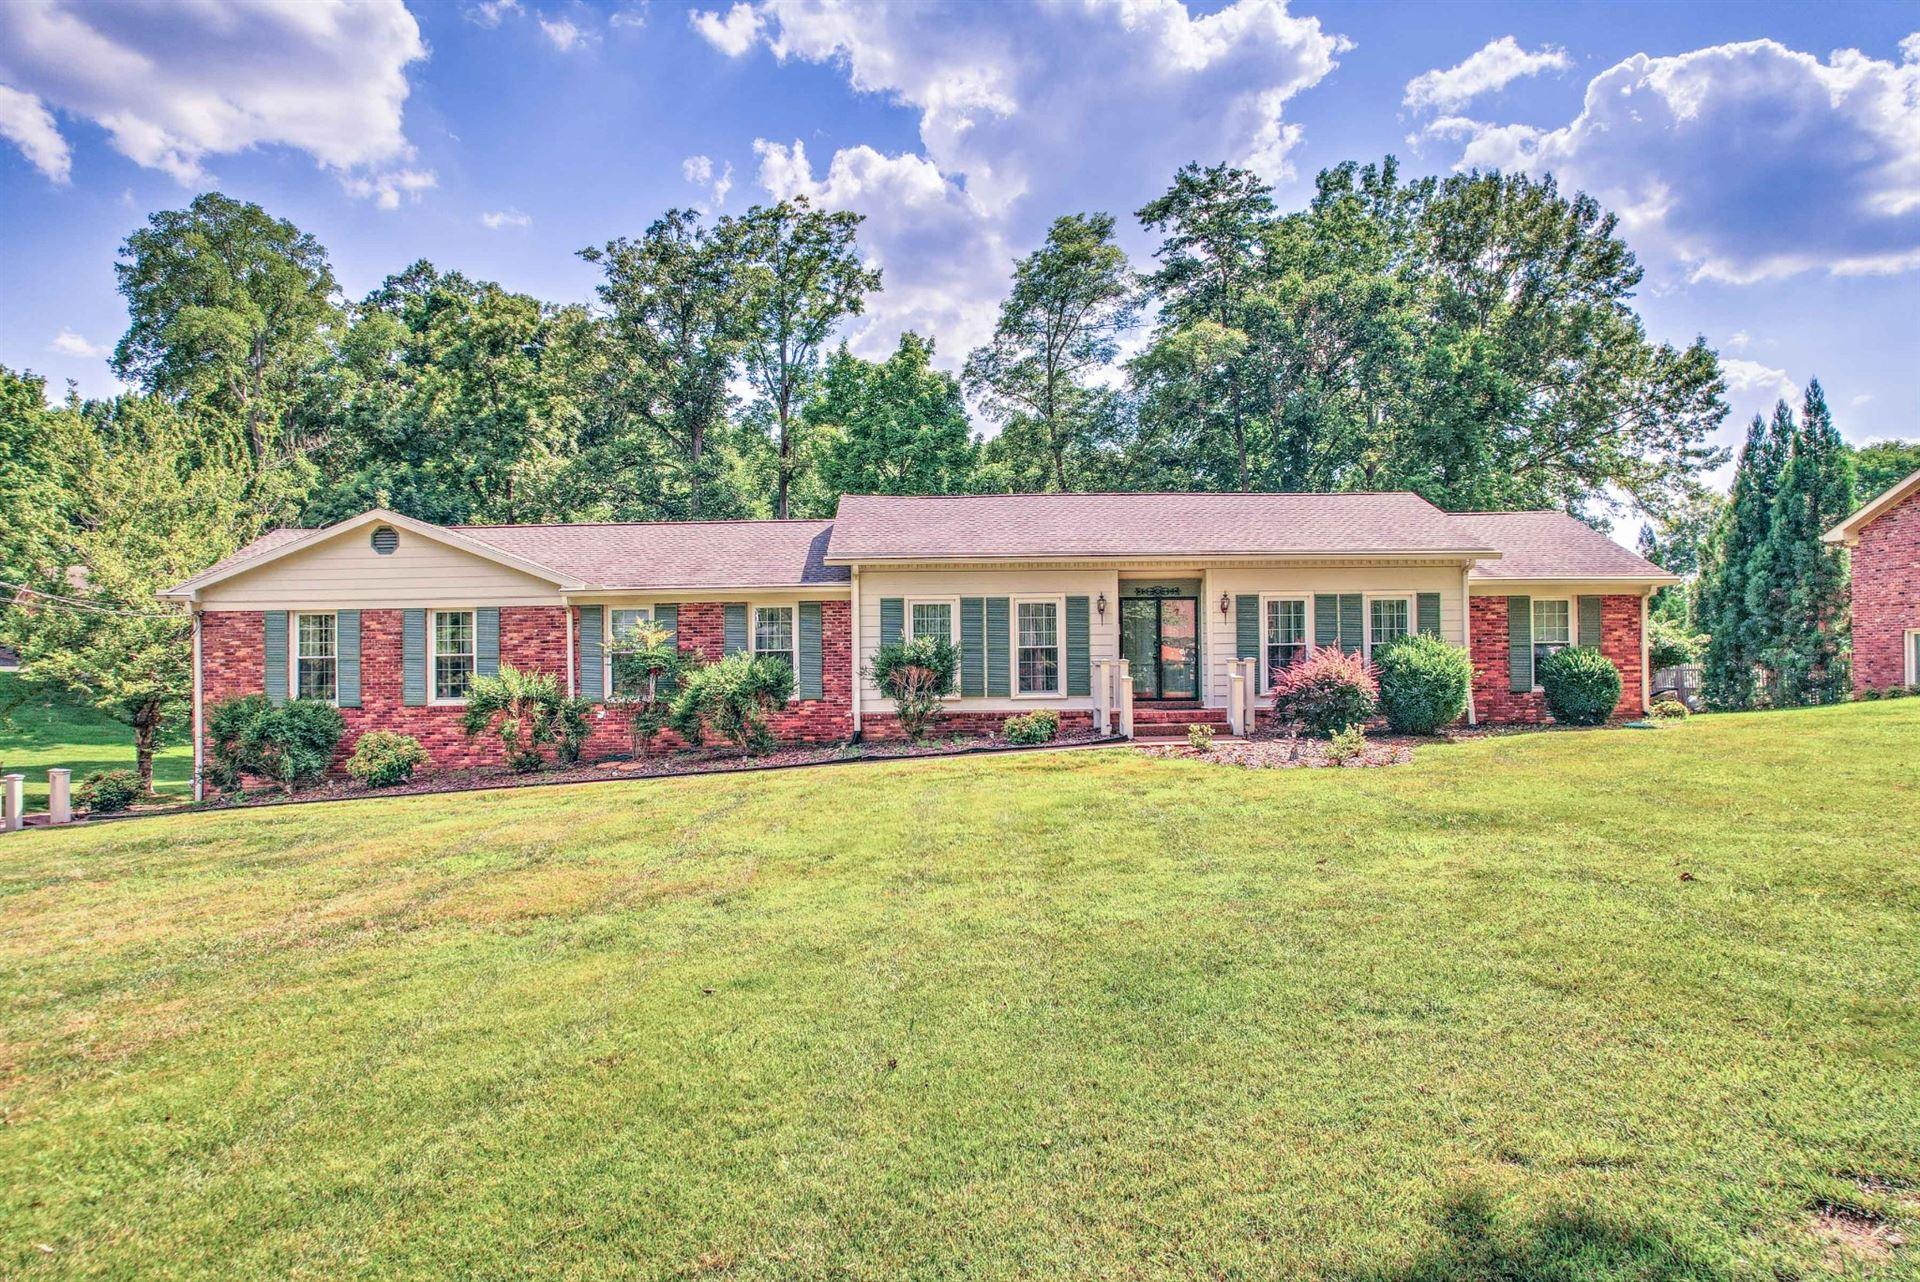 250 Hidden Lake Rd, Hendersonville, TN 37075 - MLS#: 2264472